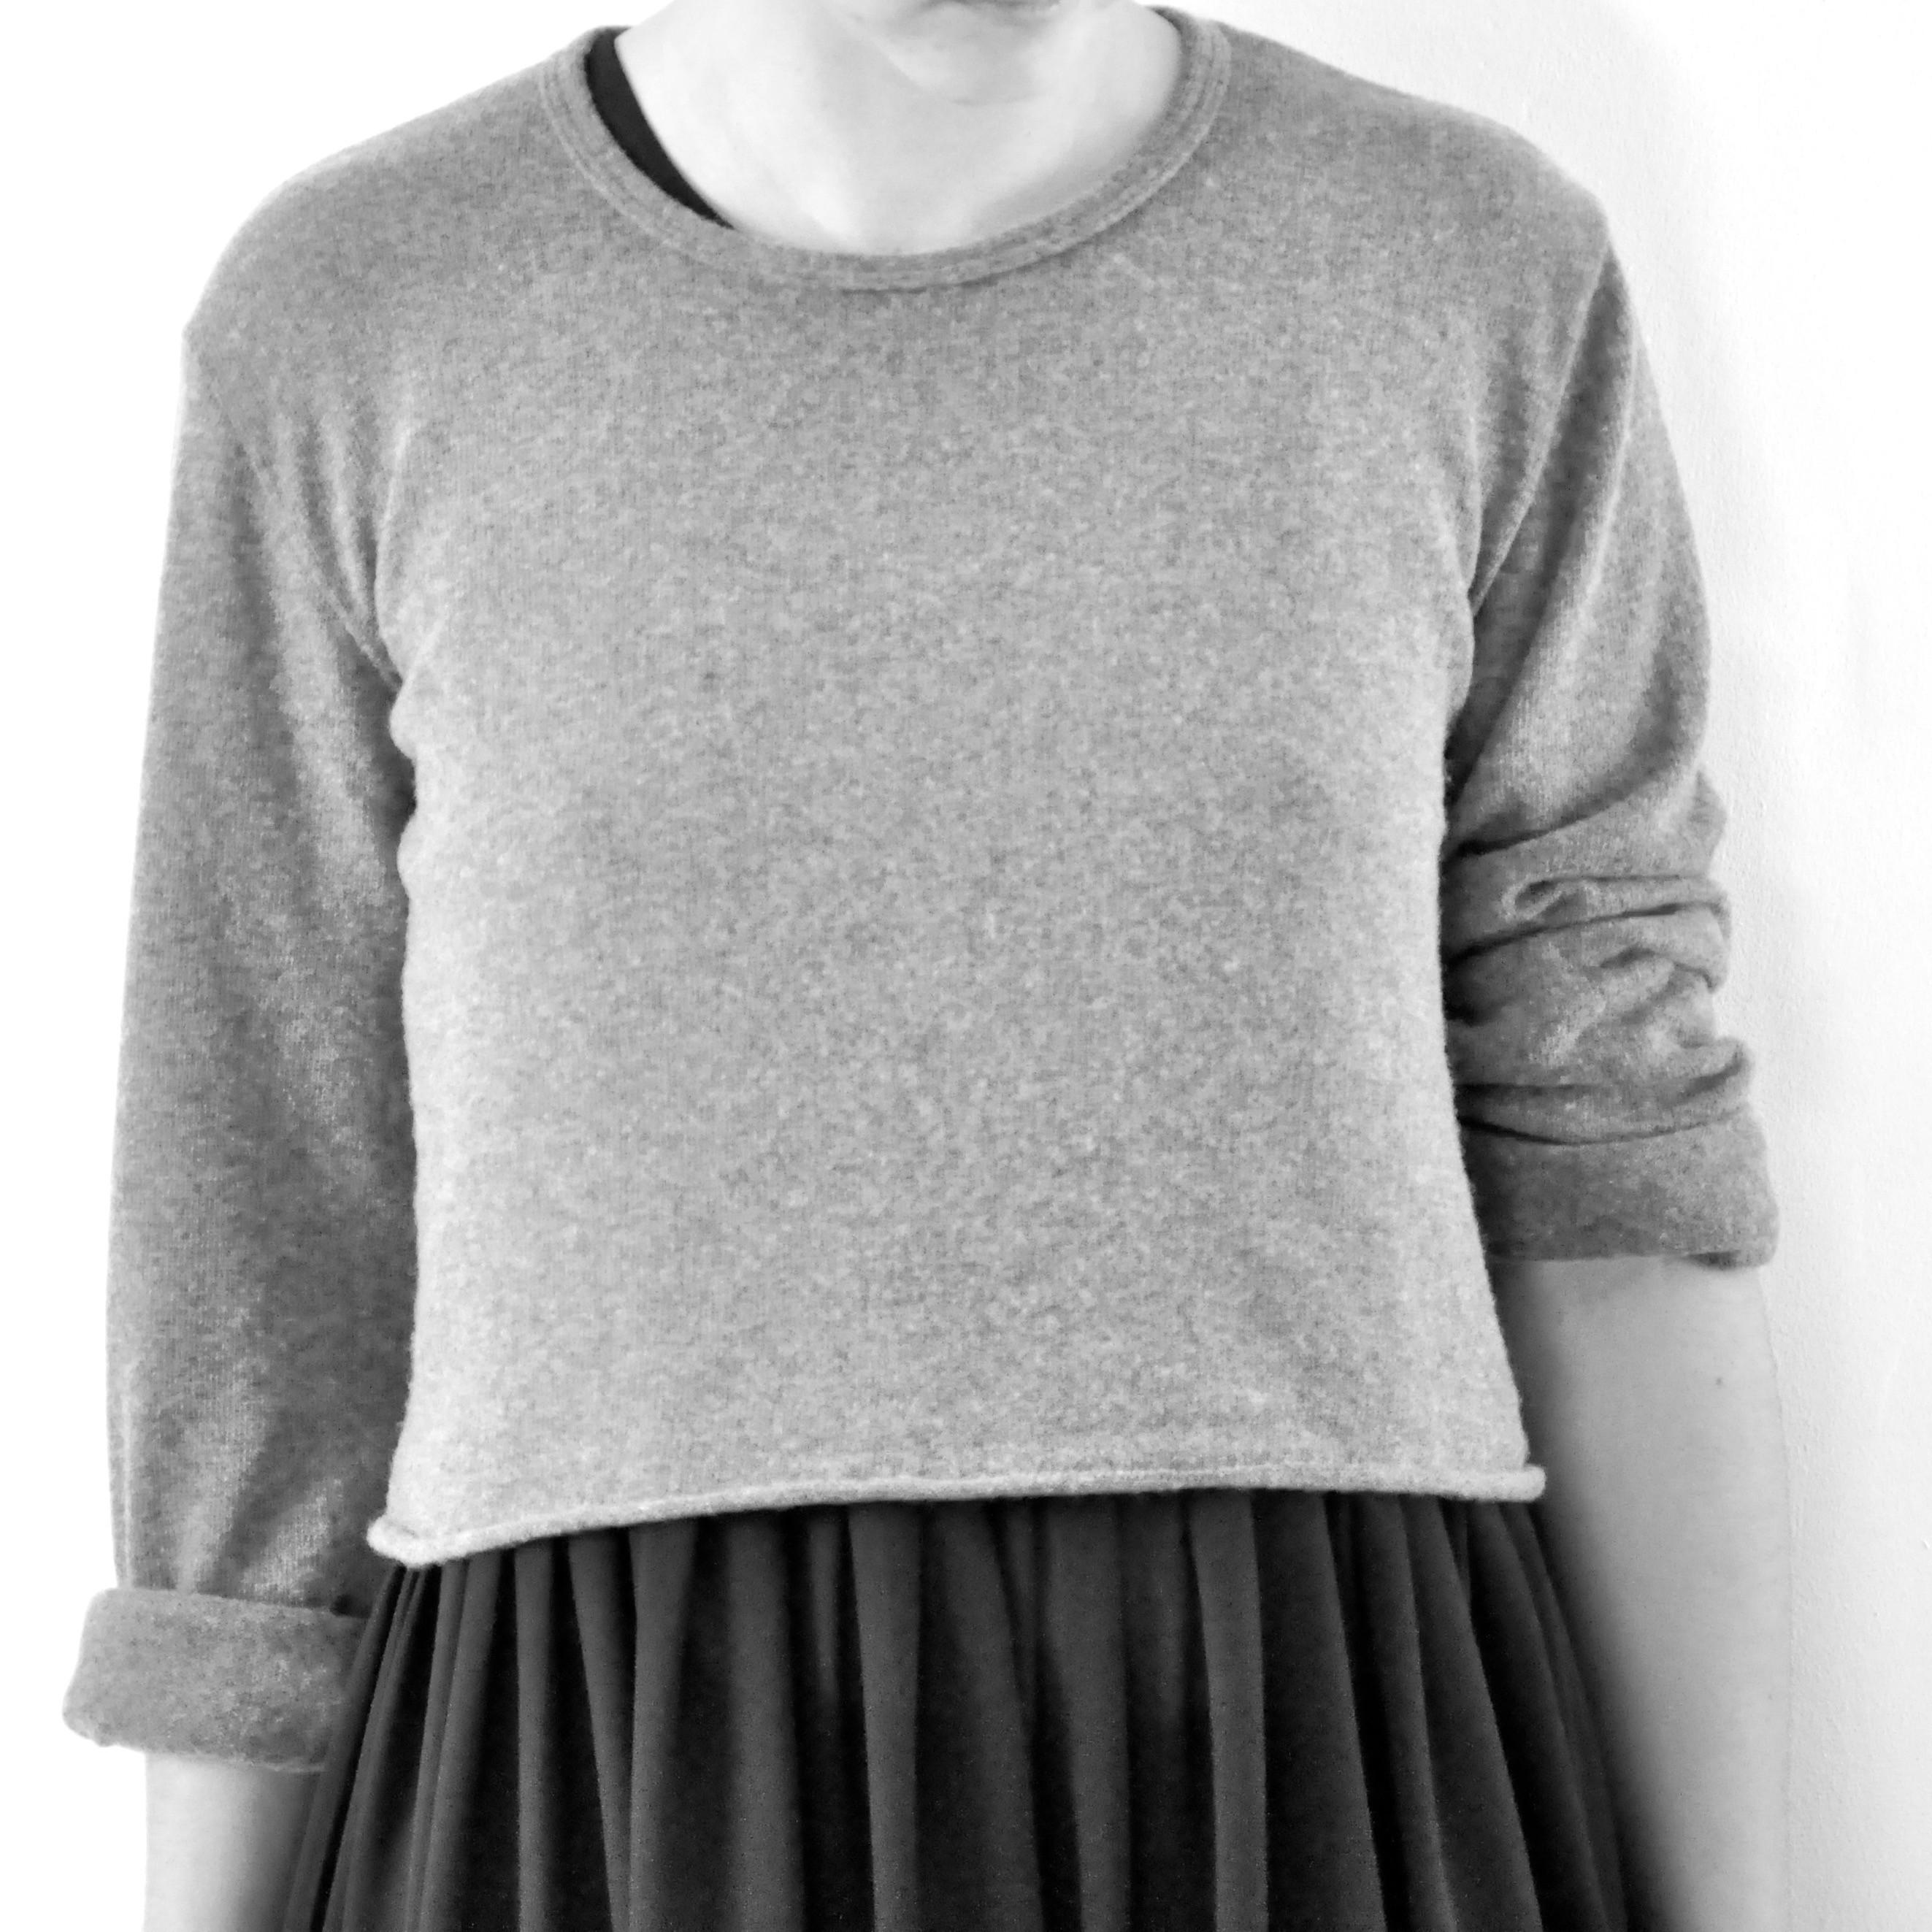 Short sweater, grey heavy knit - Le Vestiaire de Jeanne SARL